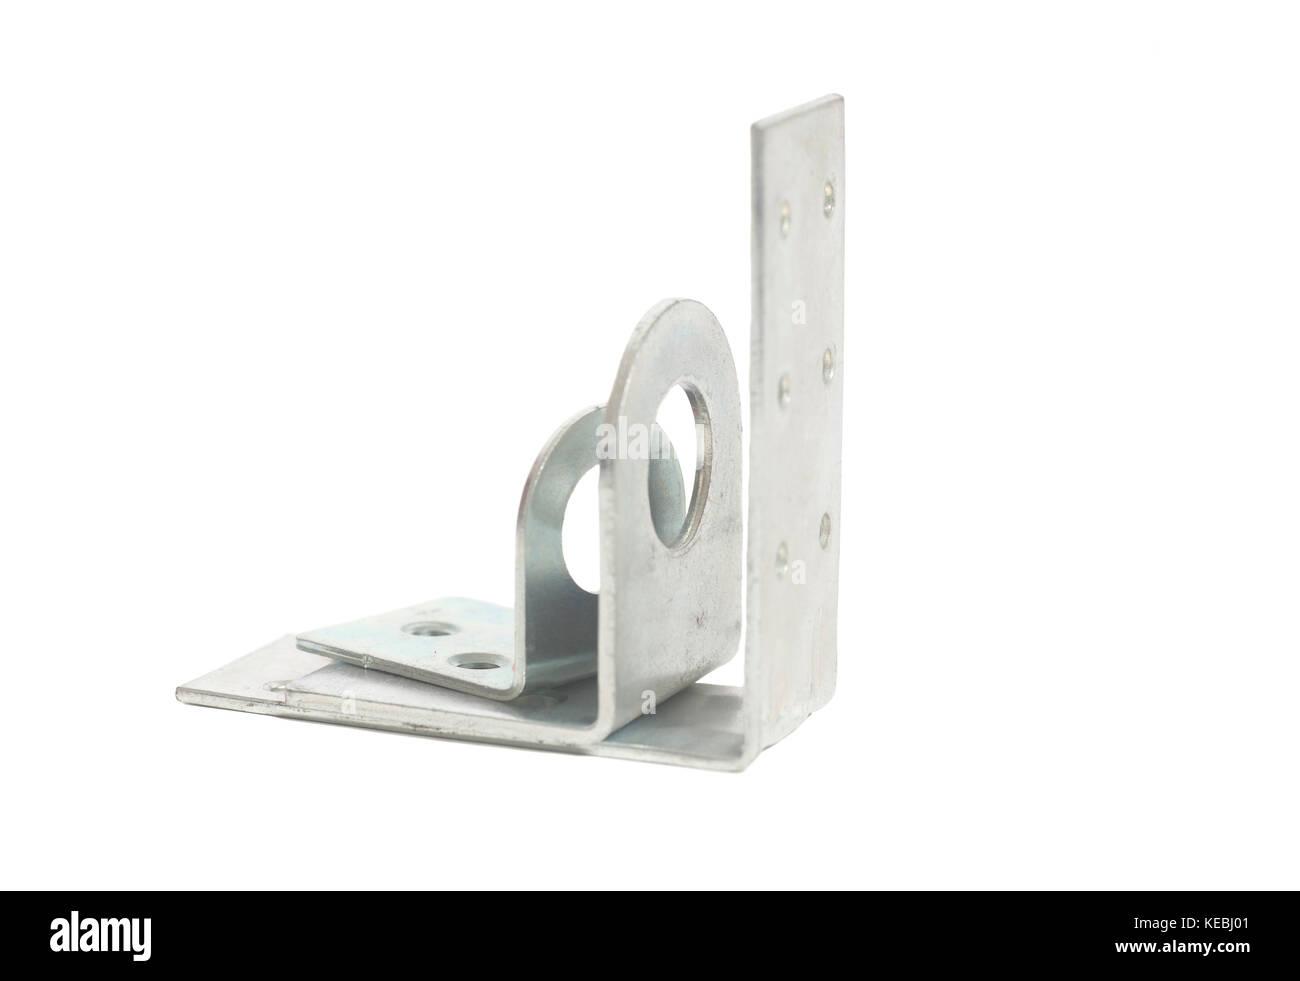 Metal corner bracket isolated on a white background - Stock Image